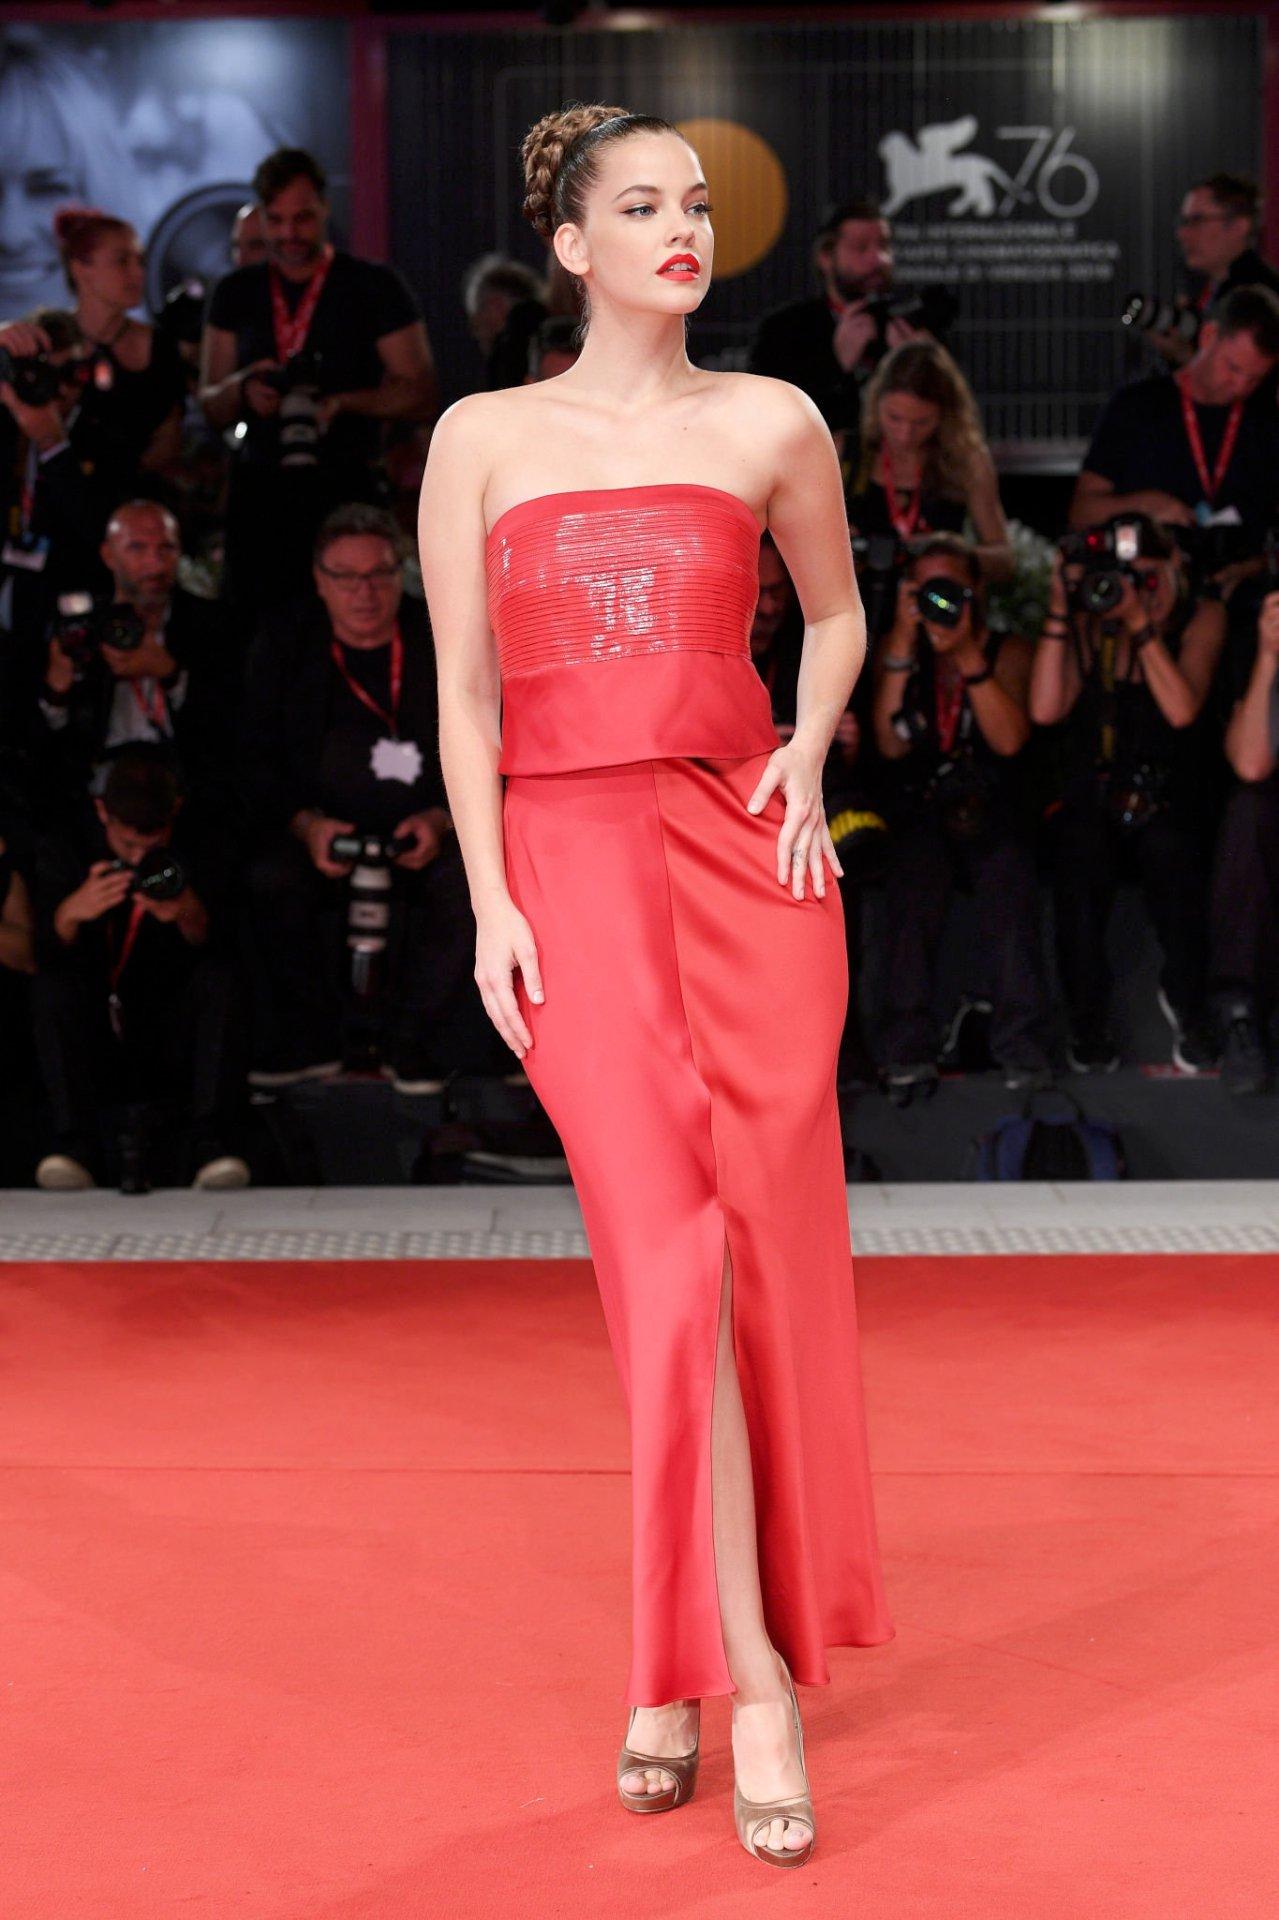 Barbara Palvin Sexy Red Dress